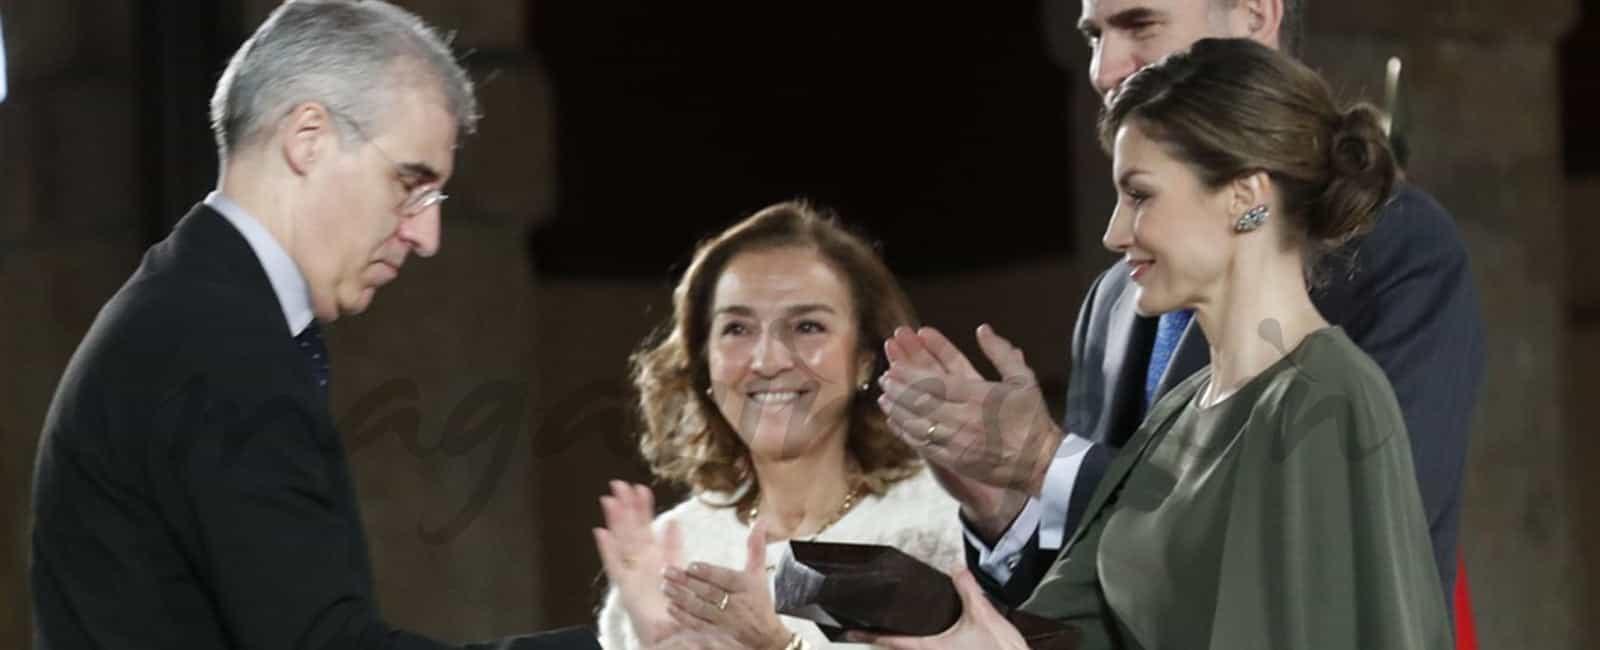 La elegancia de la reina Letizia con su vestido capa